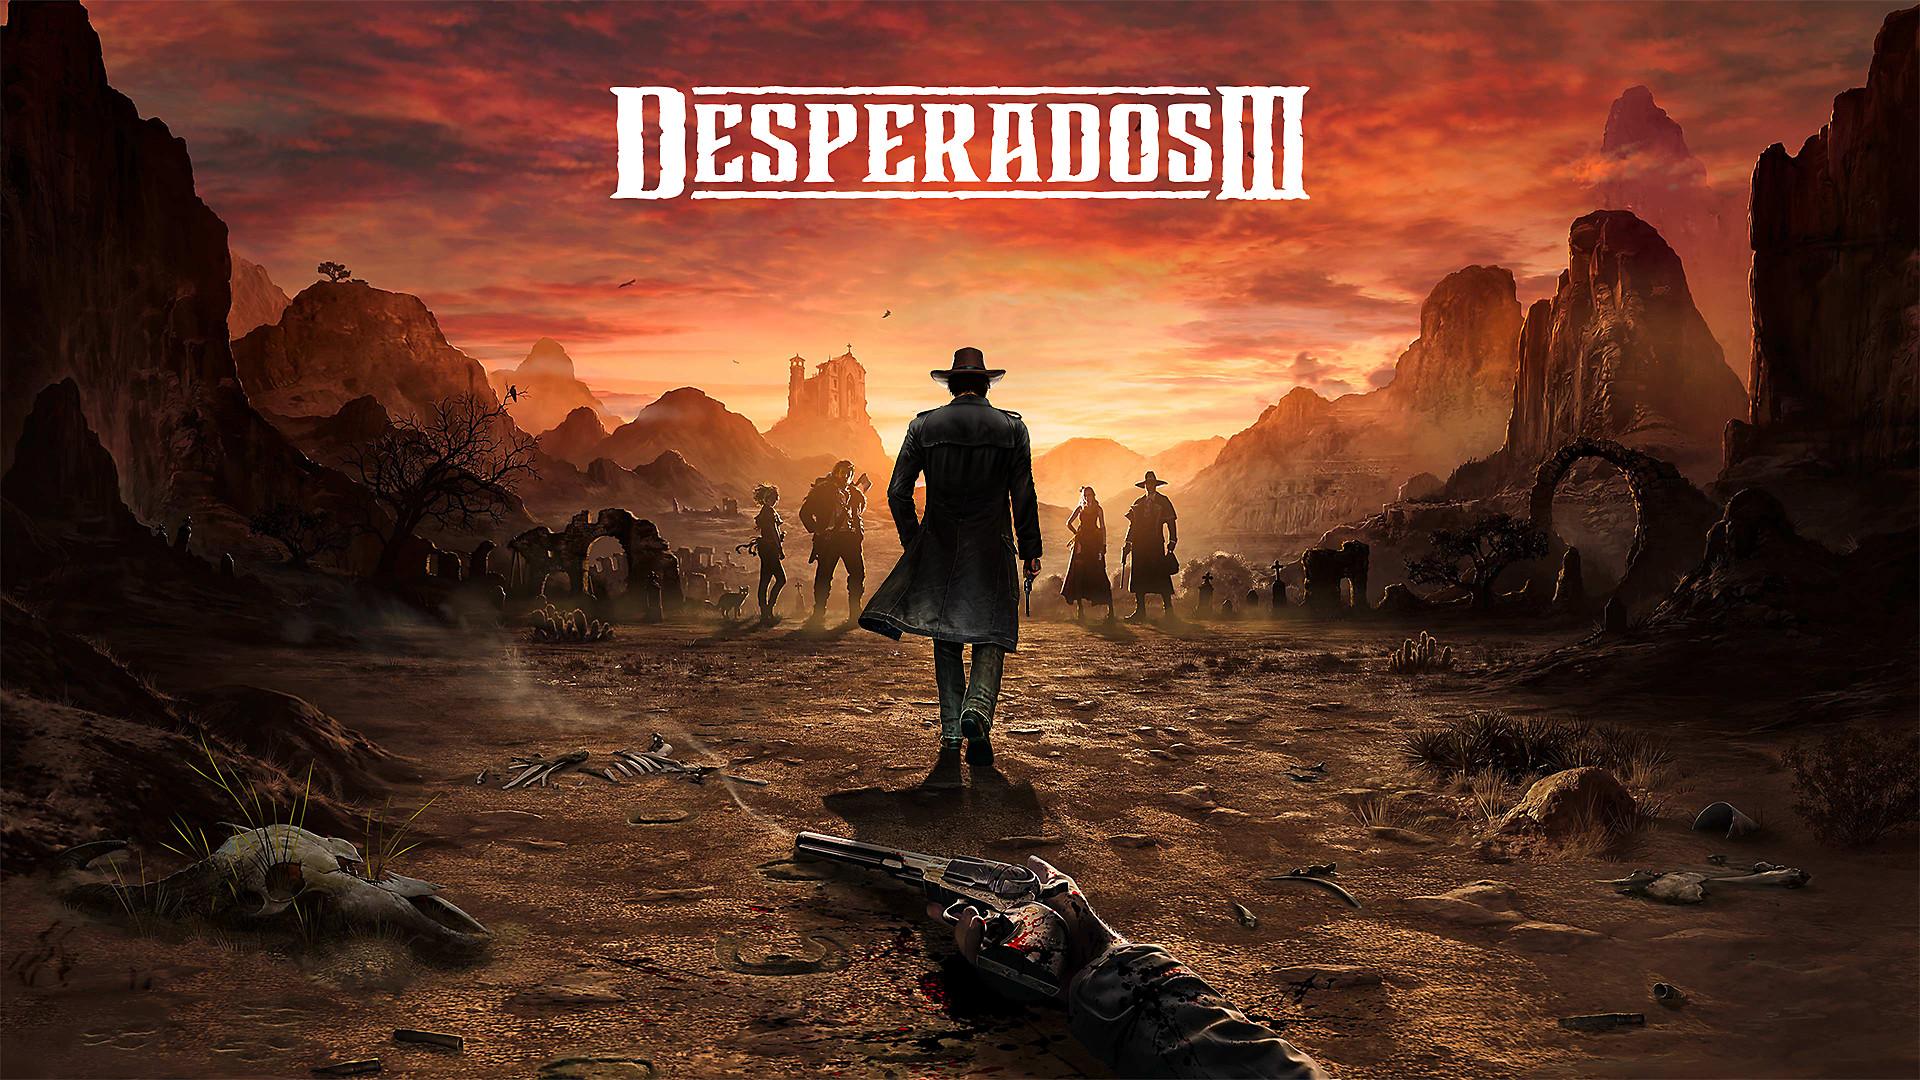 Desperados III(デスペラードス3) Decorative Background